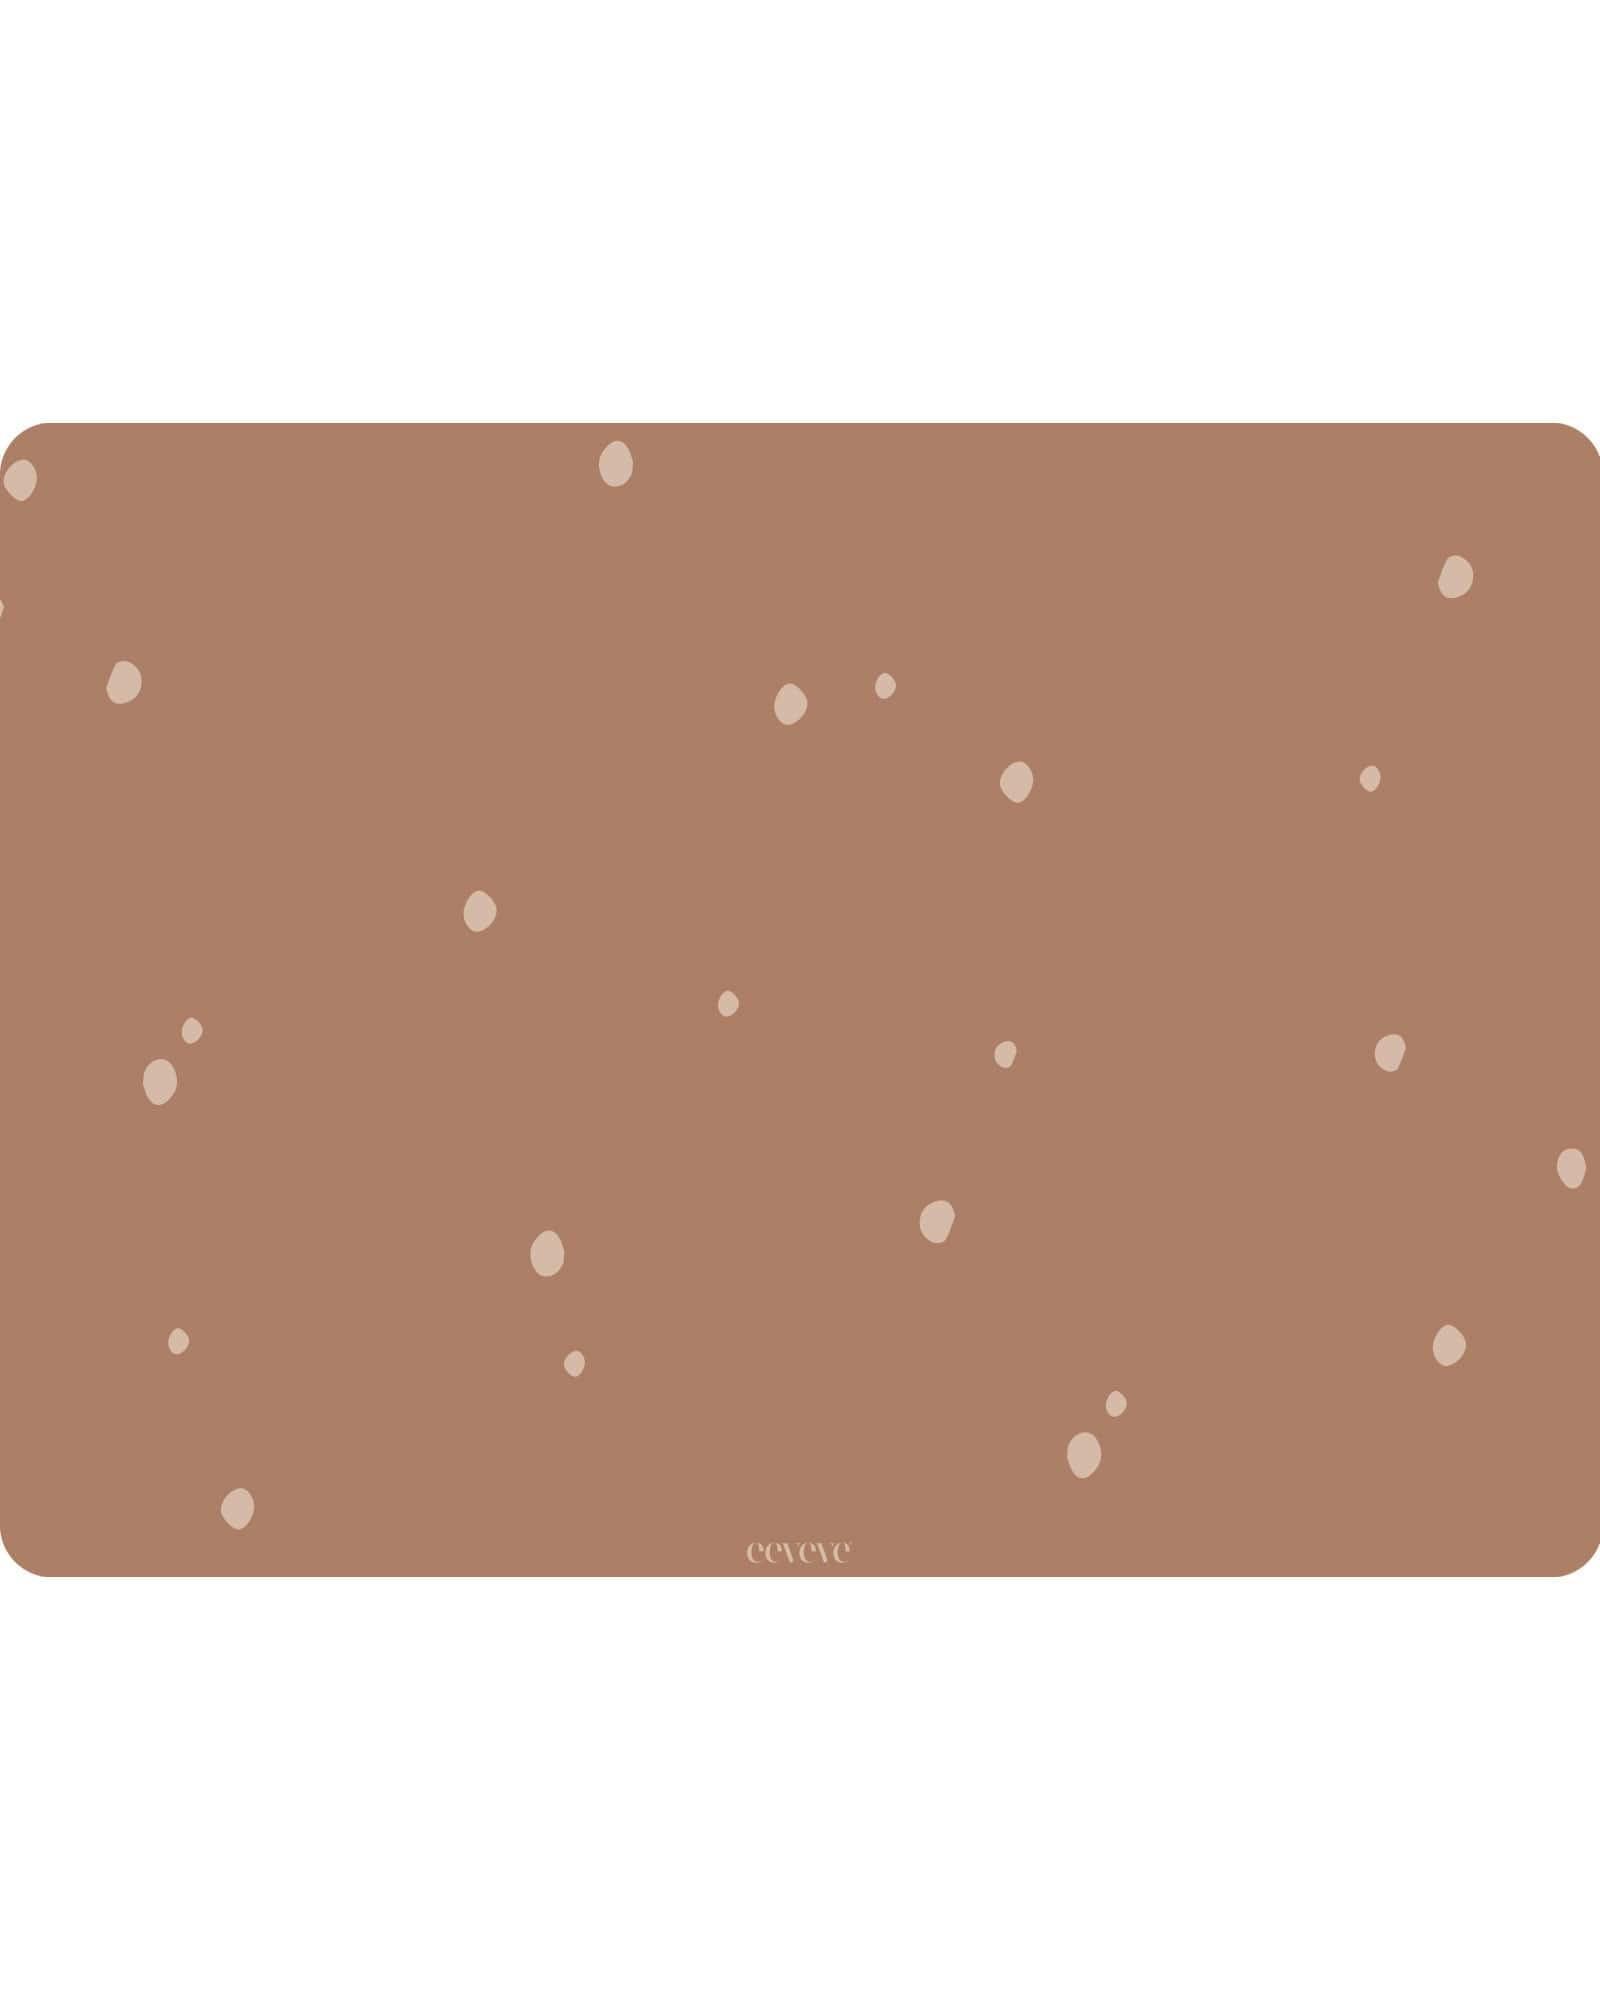 Eeveve - 6x Placemats Dots - Cinnamon